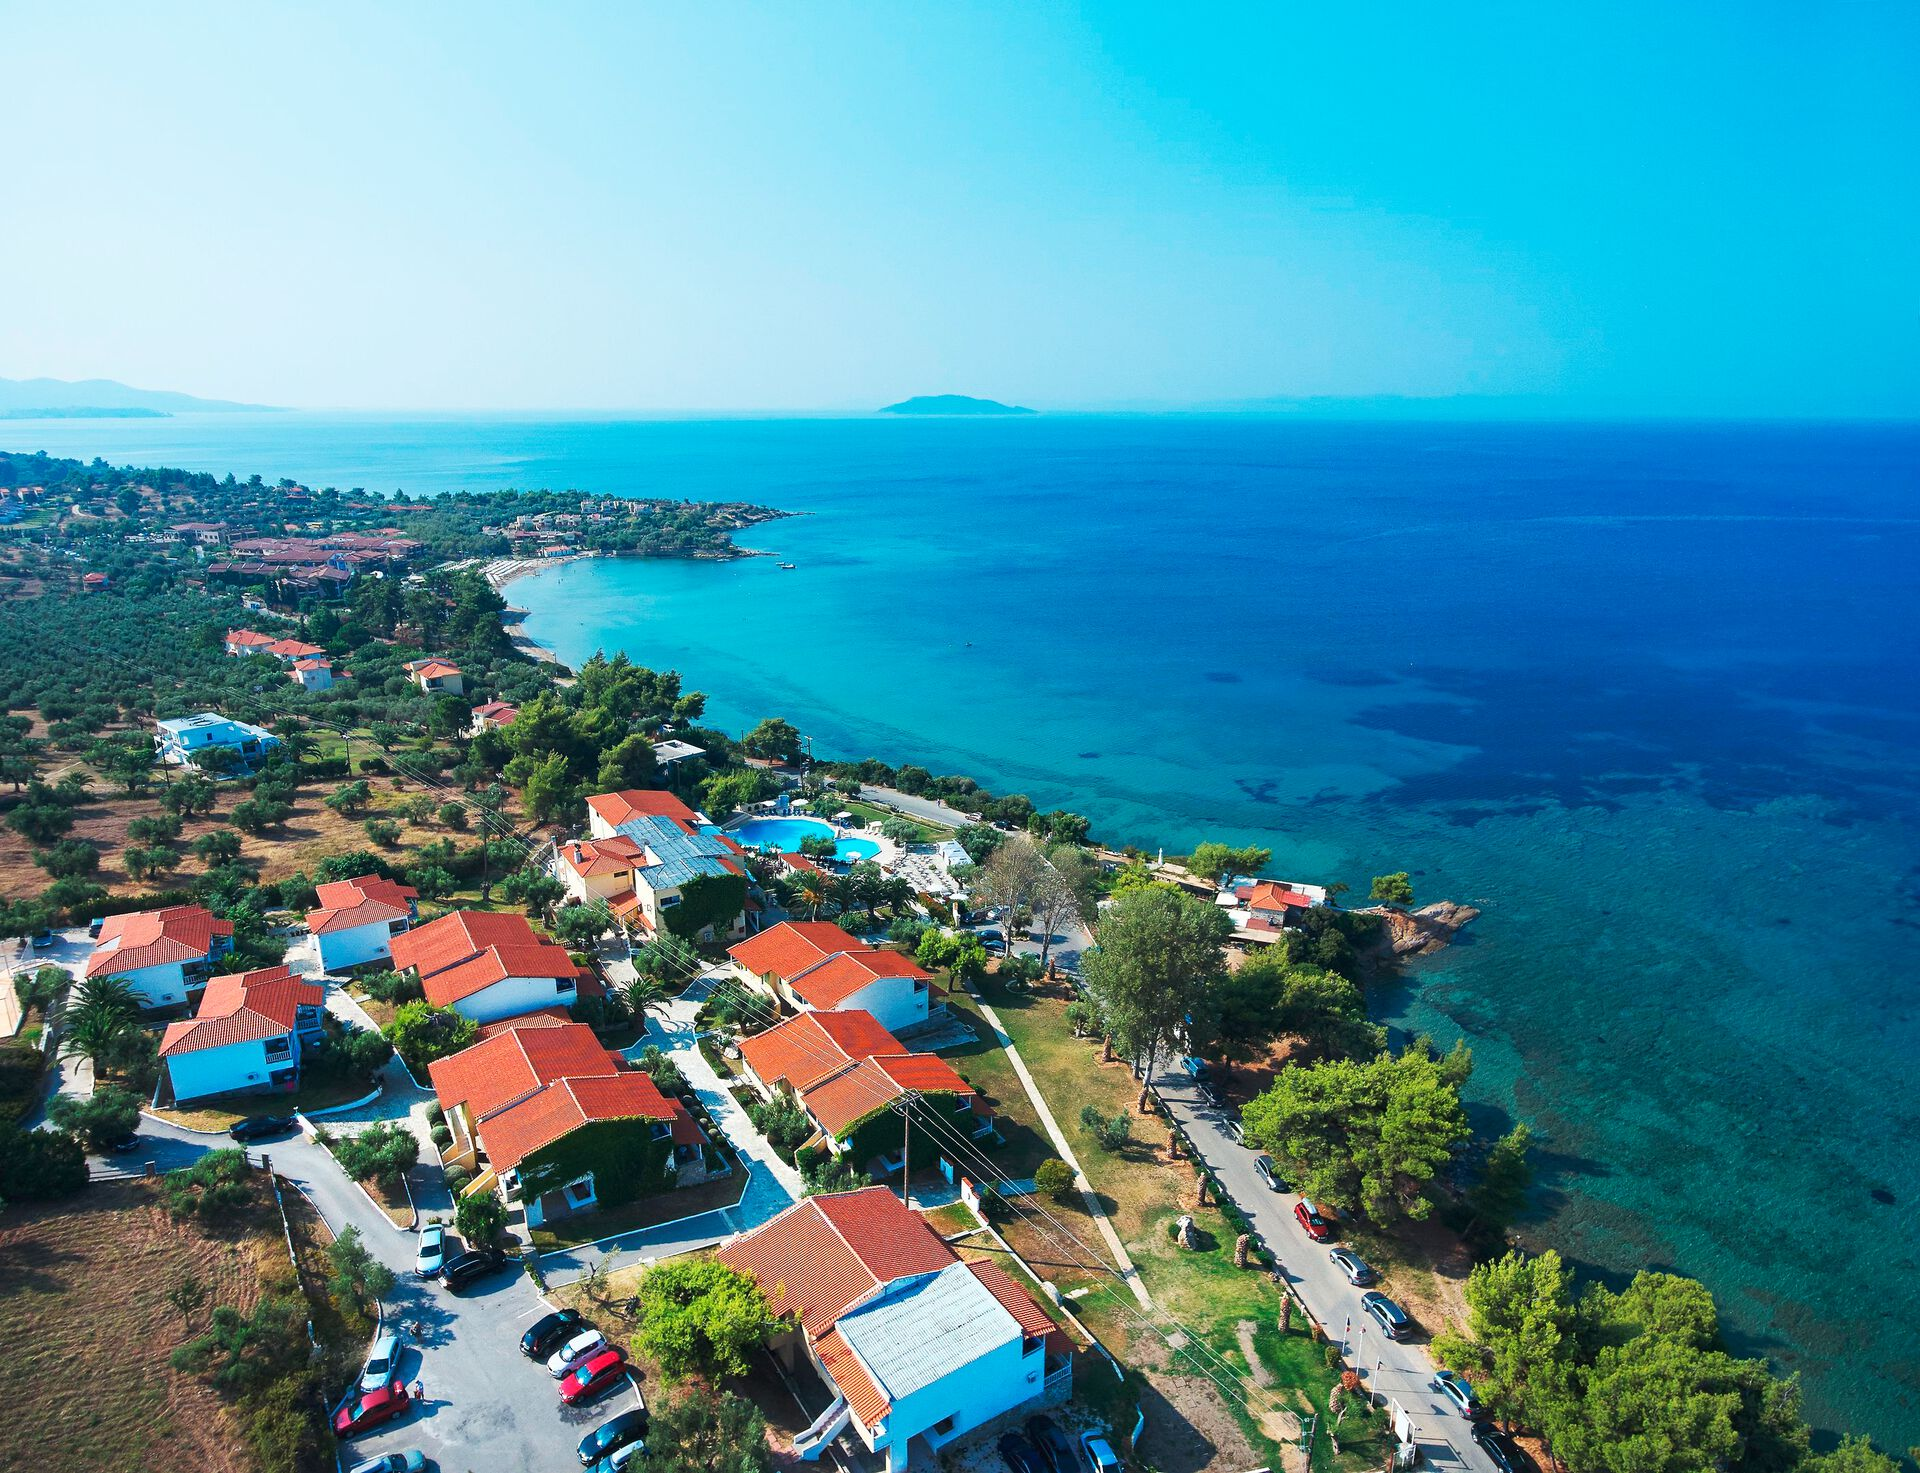 Acrotel Elea Beach - 4*